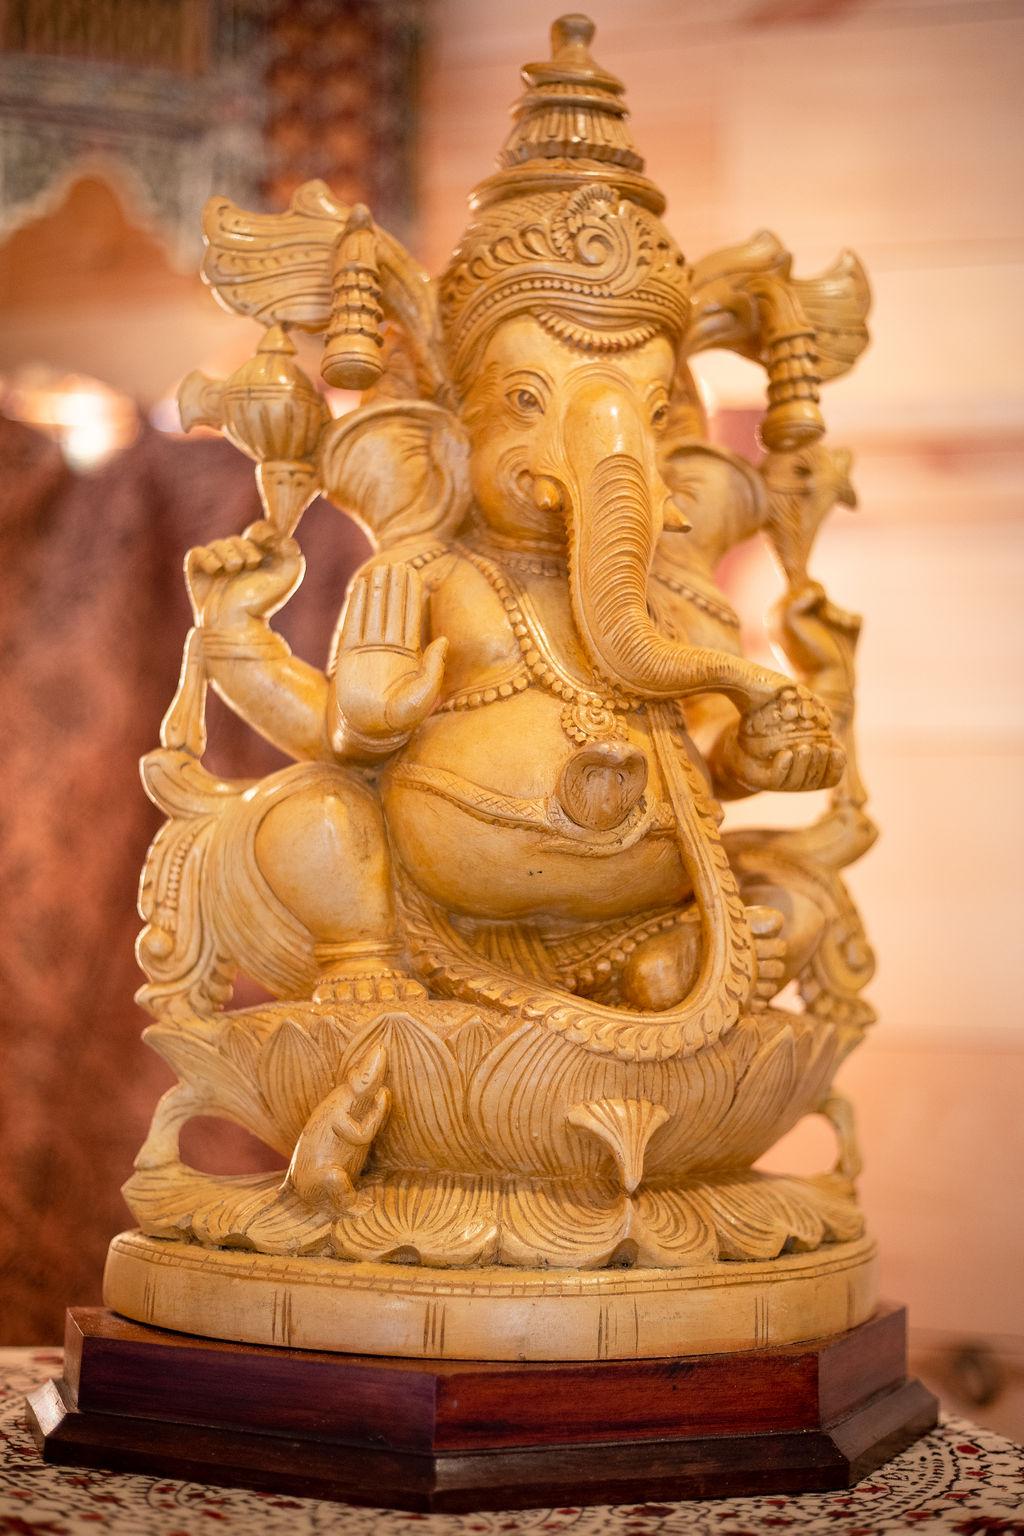 Daily Sanskrit Chanting